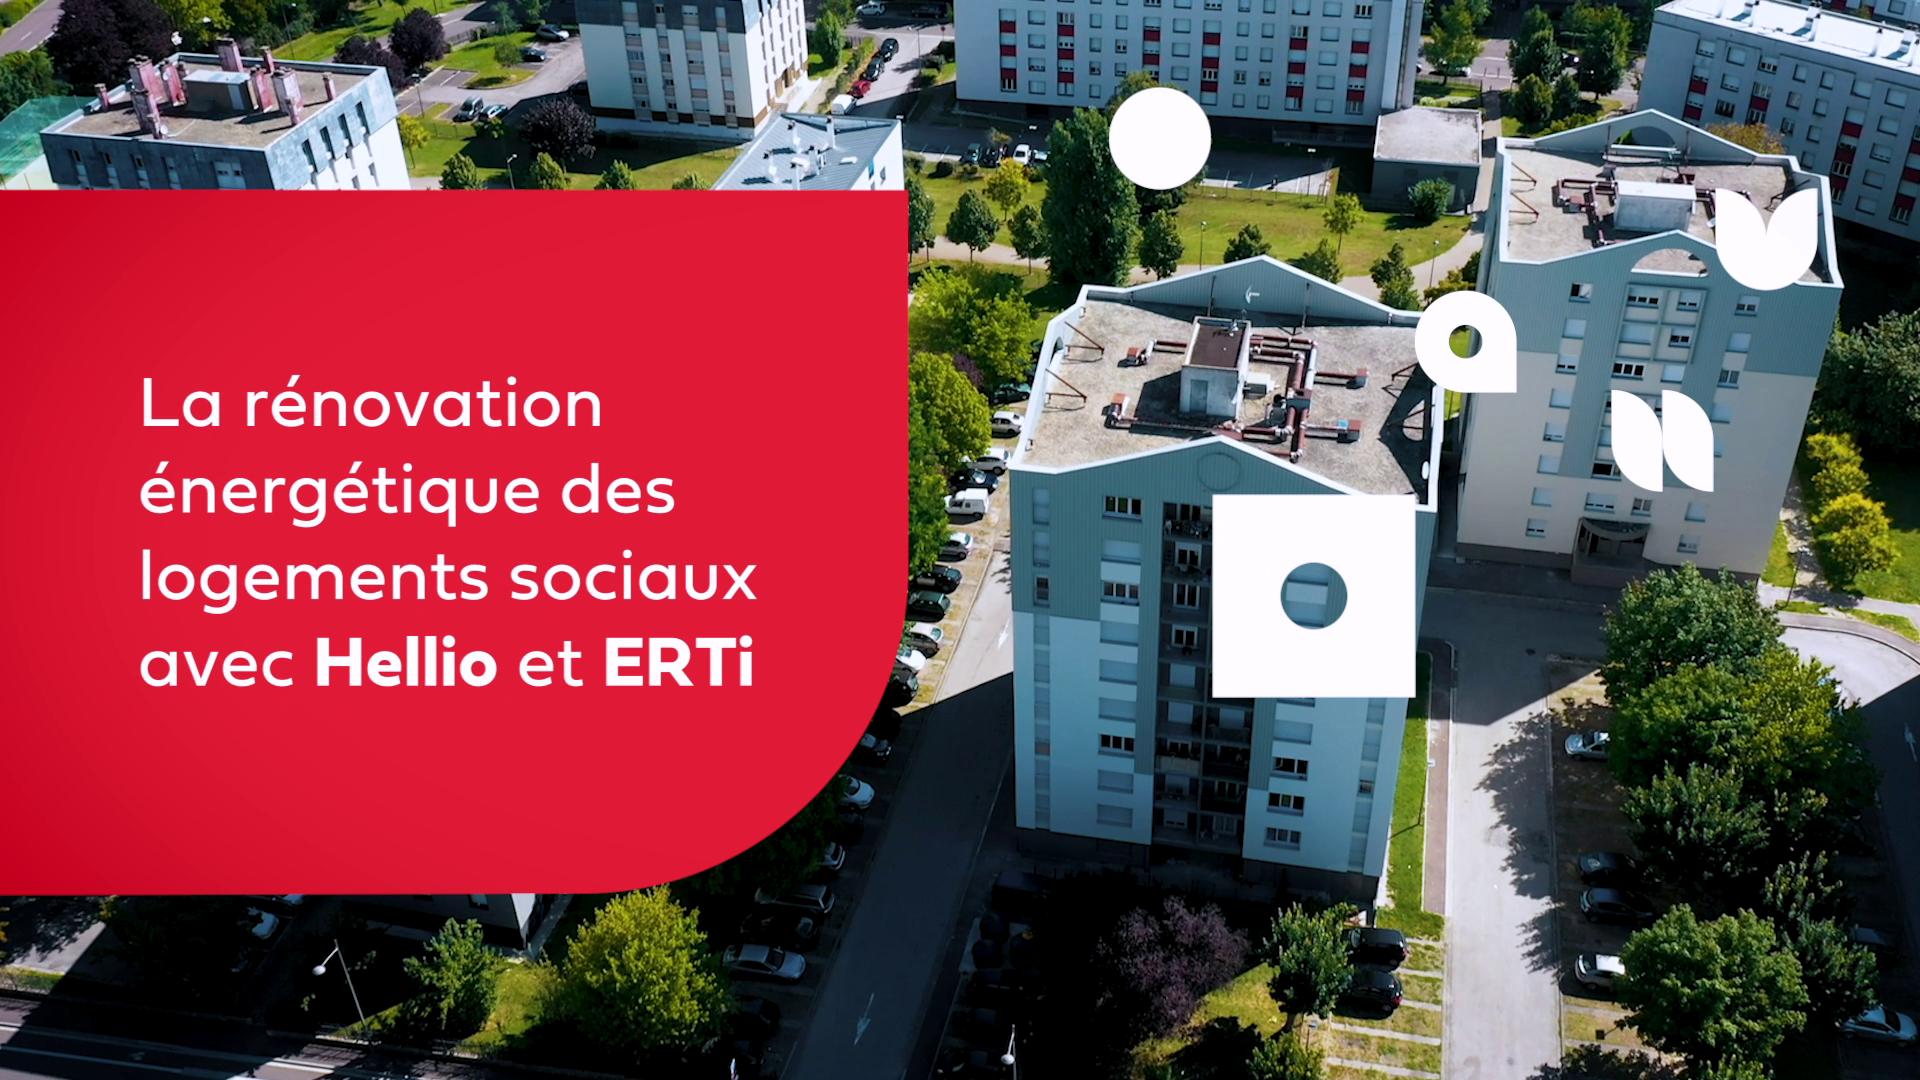 Hellio_ERTI_Troyes_Nouvellecharte